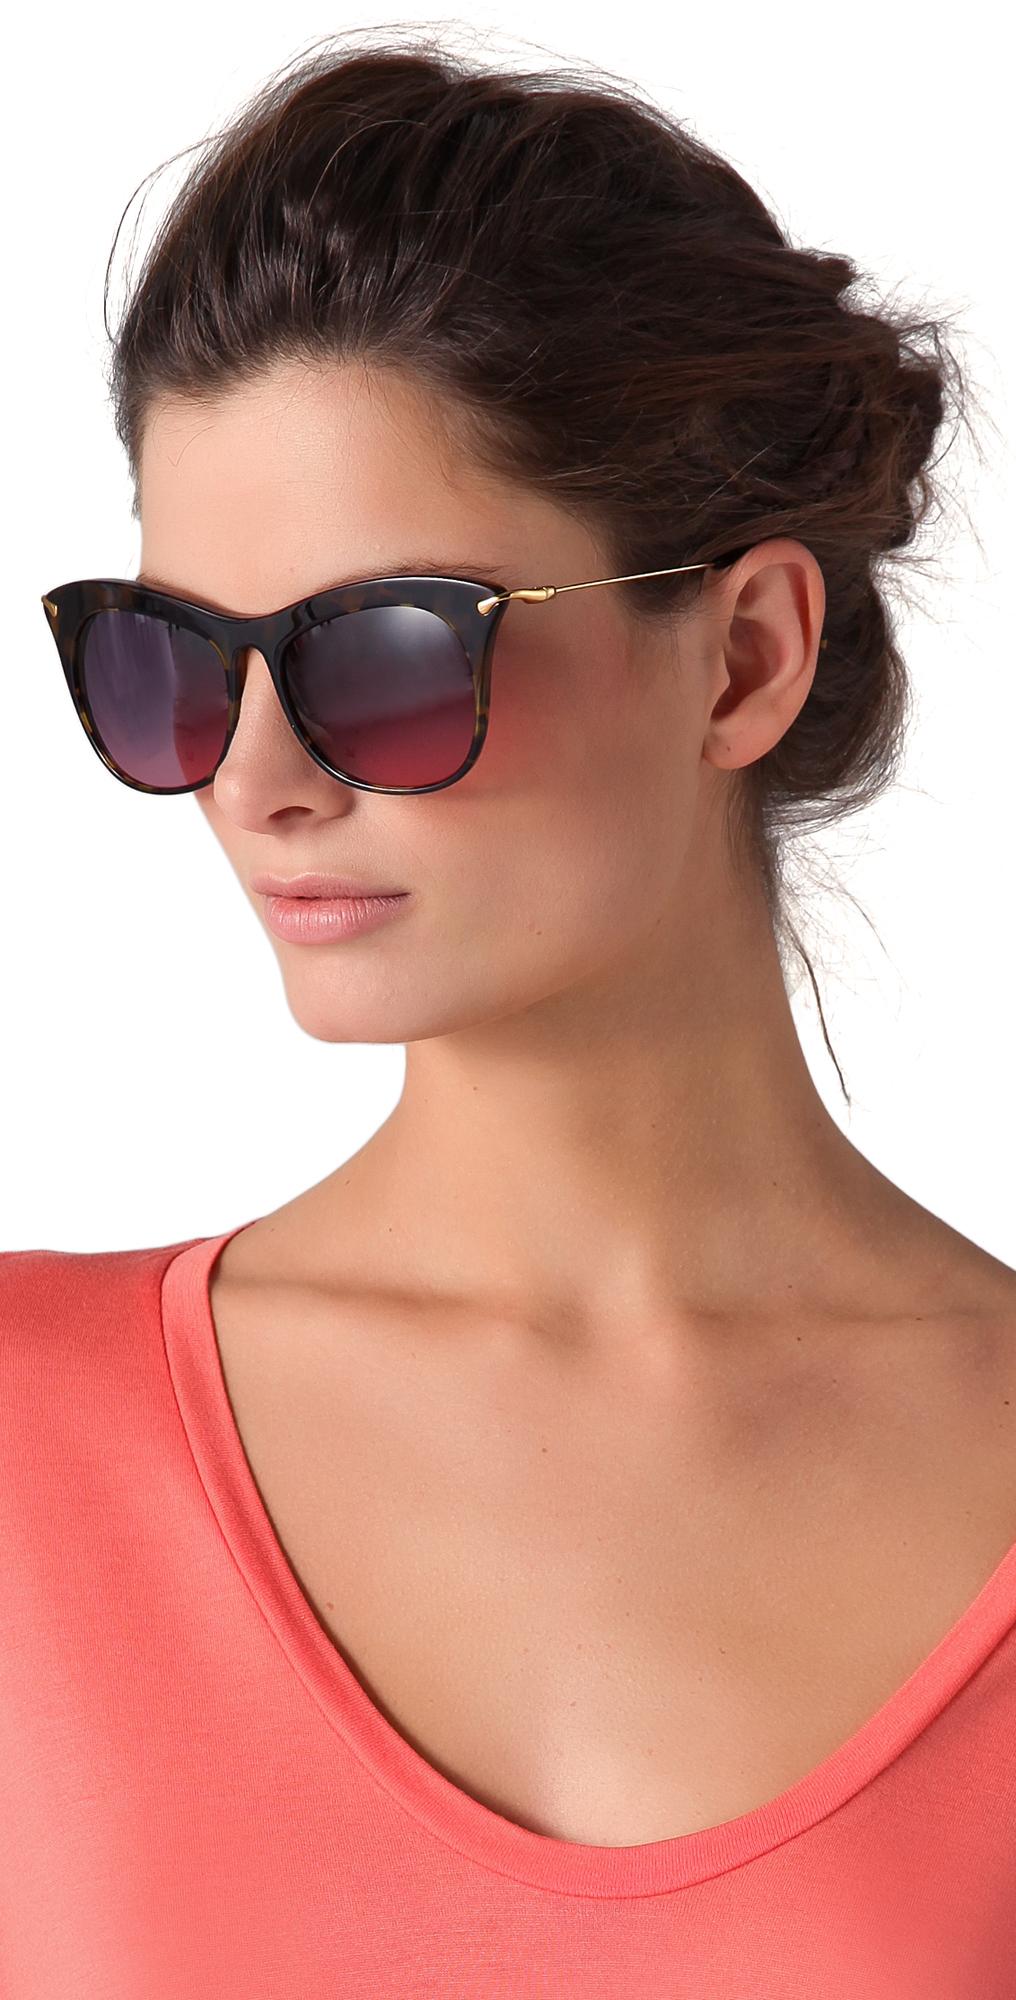 560a765312 Elizabeth and james tortoise fairfax sunglasses tortoise product normal jpg  1016x2000 Elizabeth james eyewear